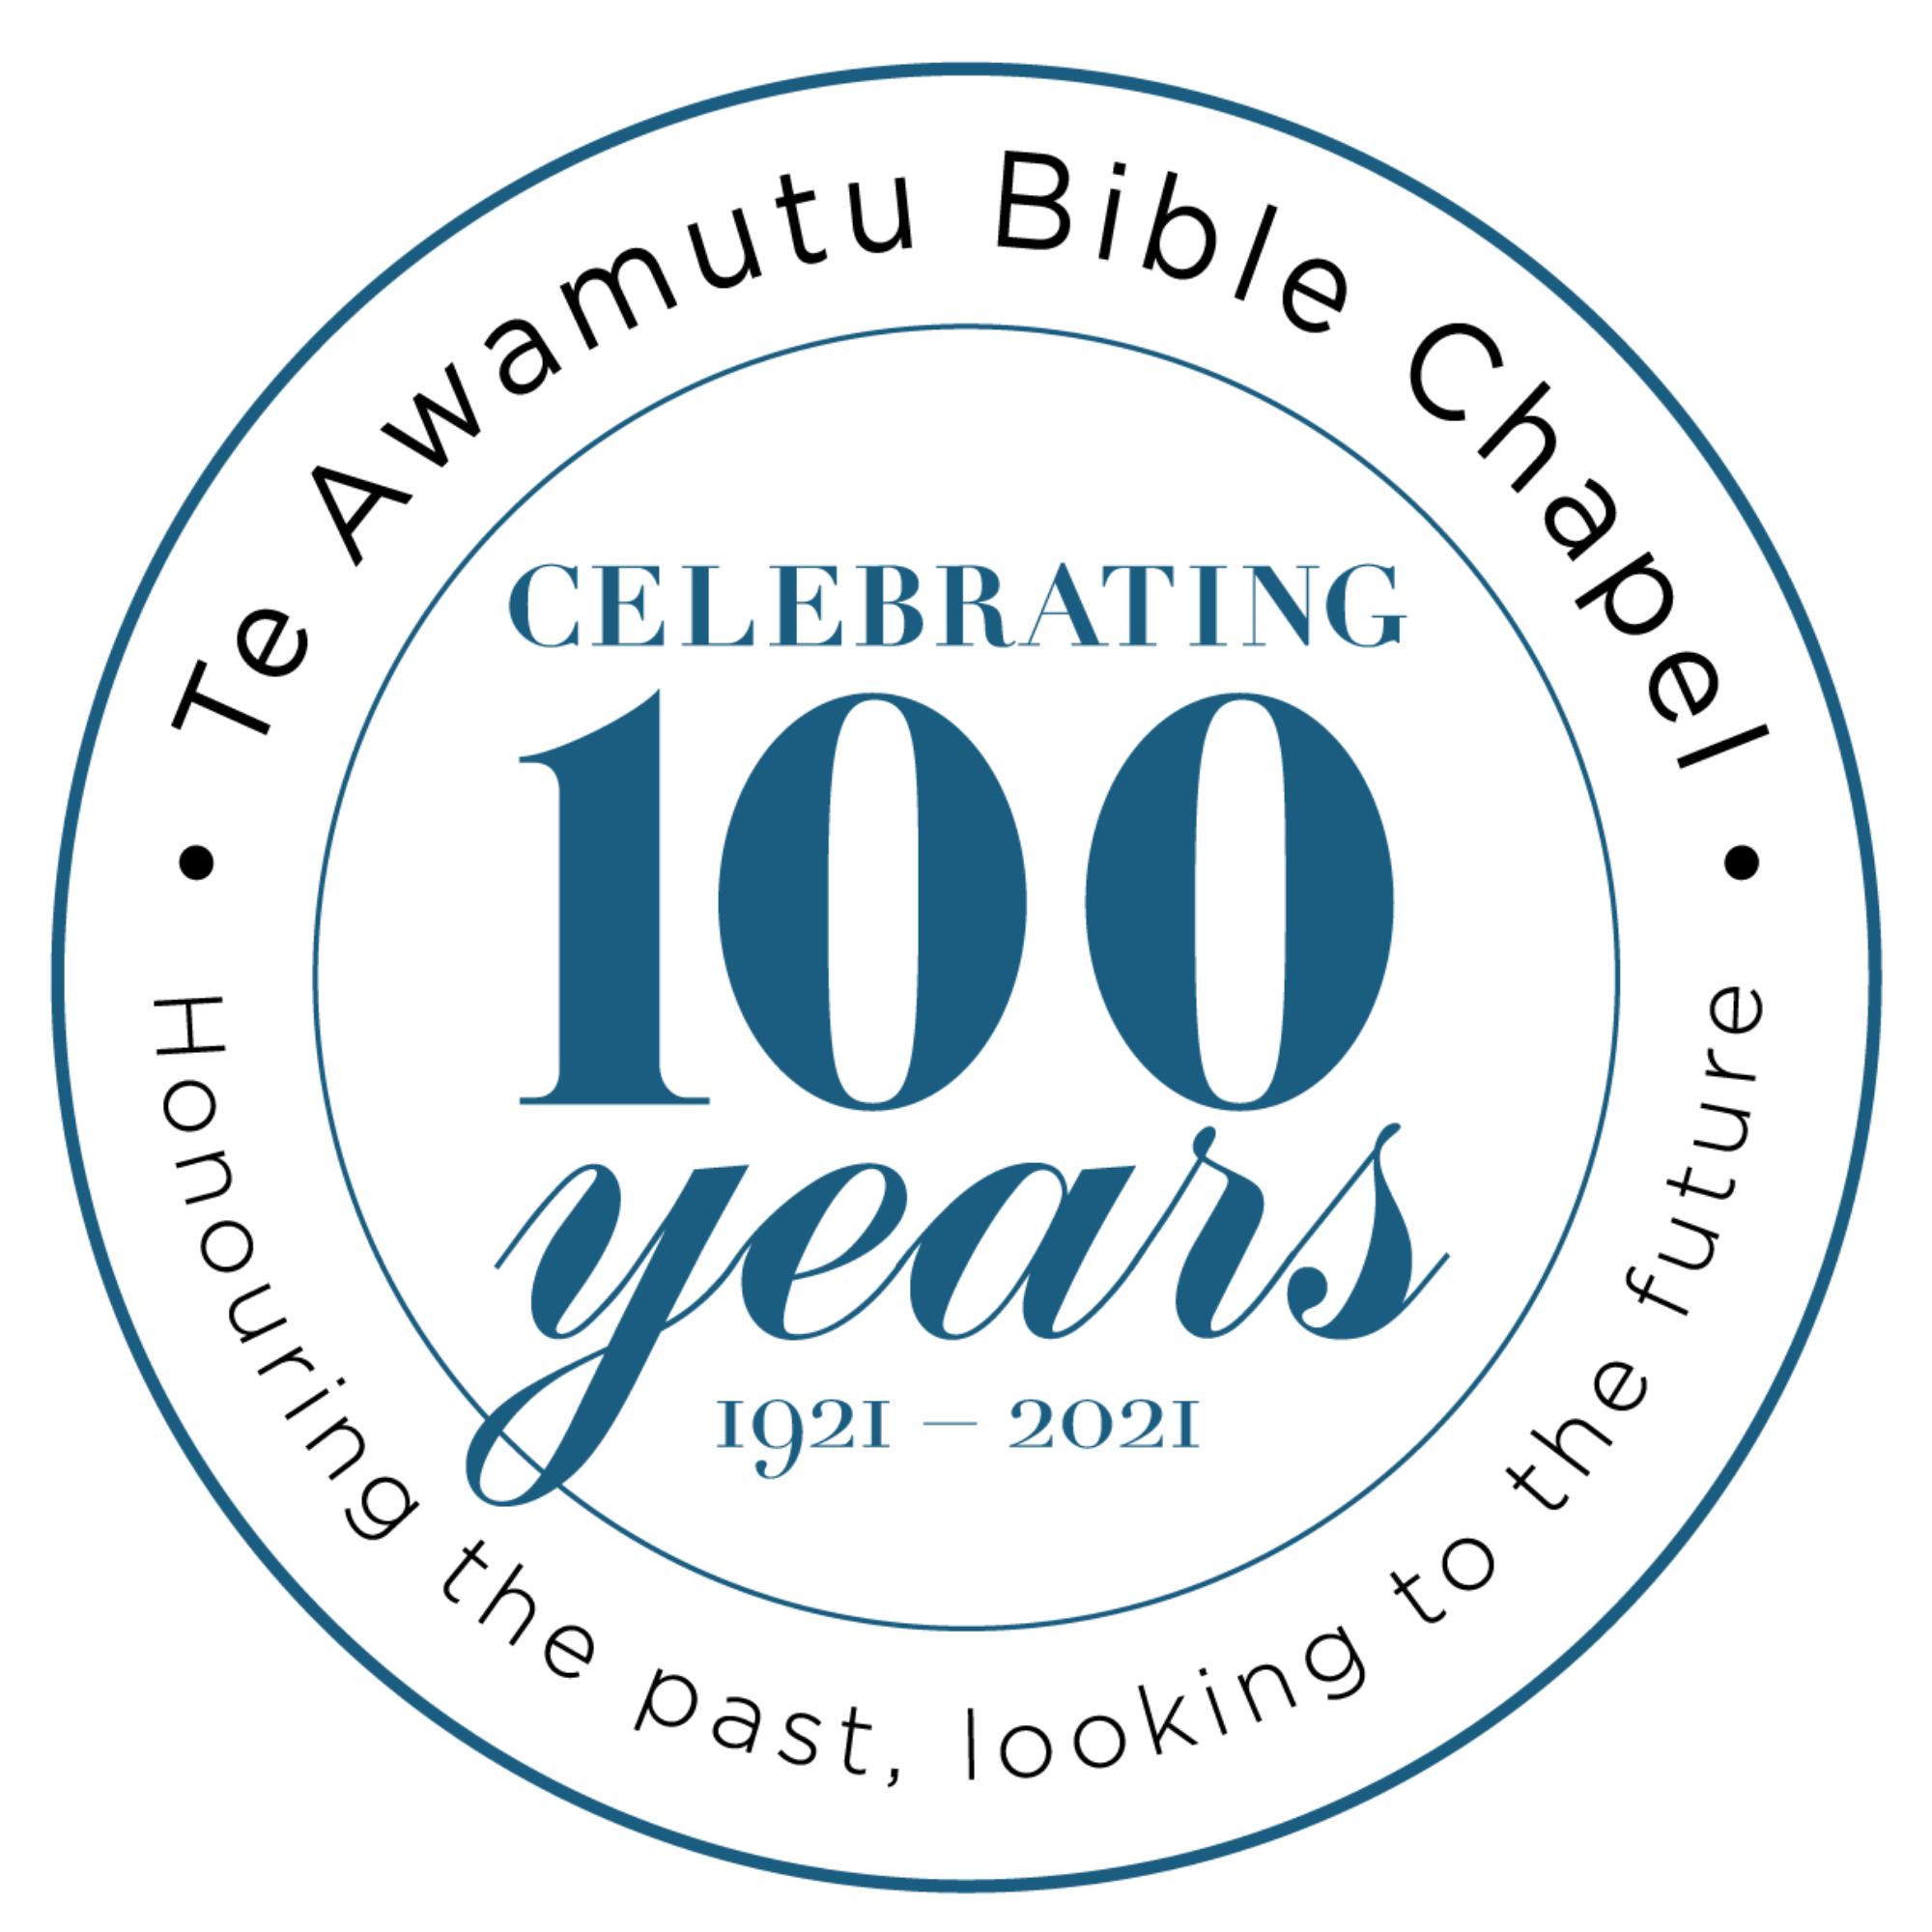 Centennial Registration